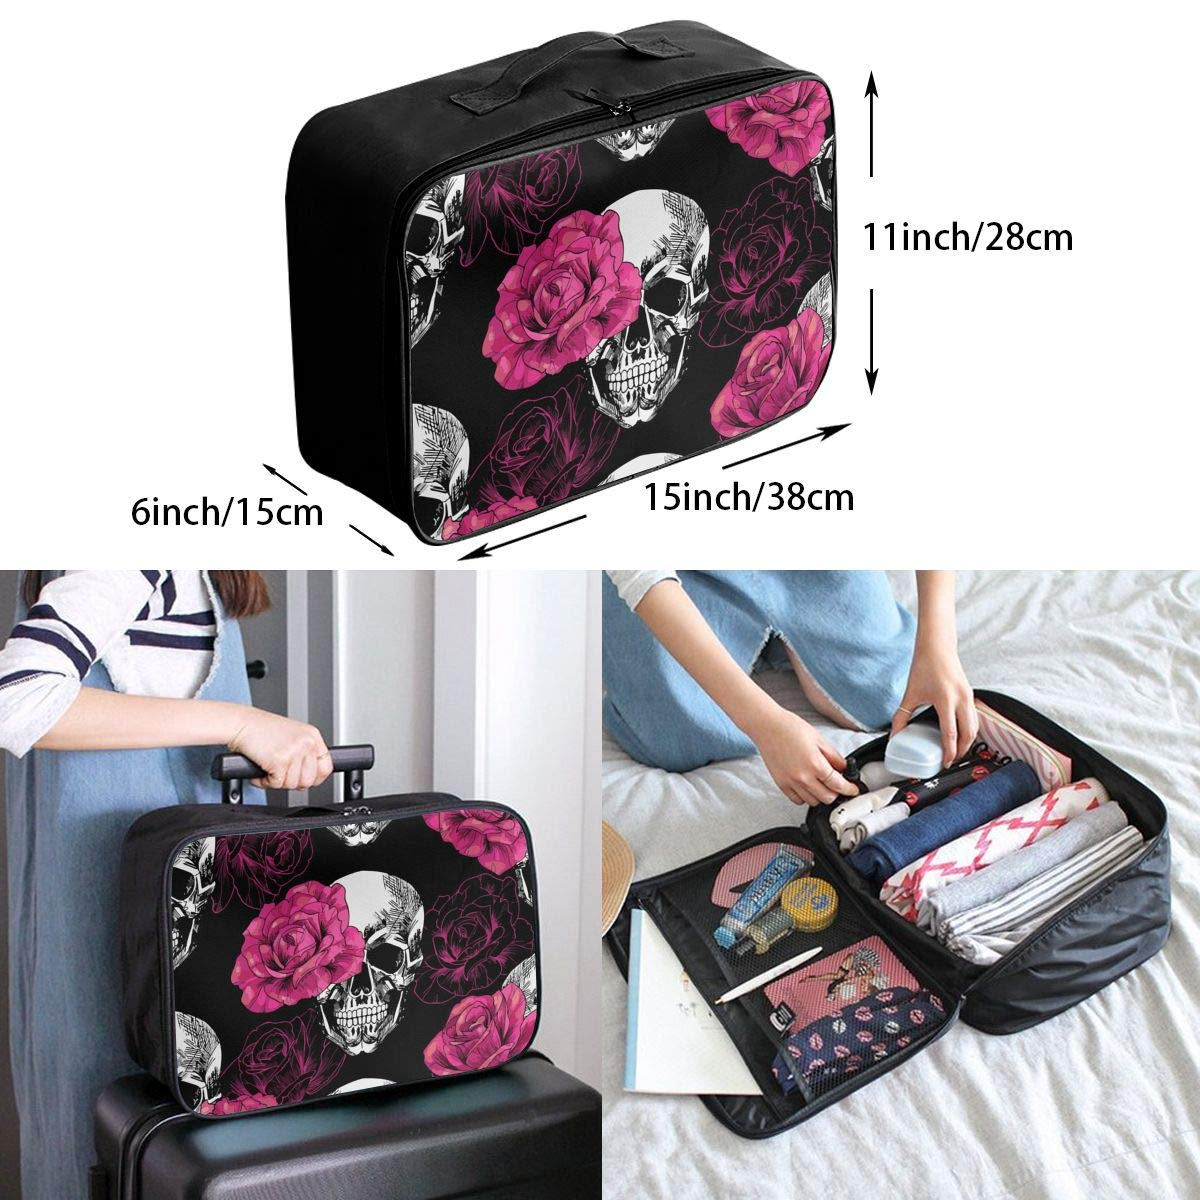 Kylin Express Portable Shoe Bag Shoes Organizer Holder Storage Bag Travel Outdoors G